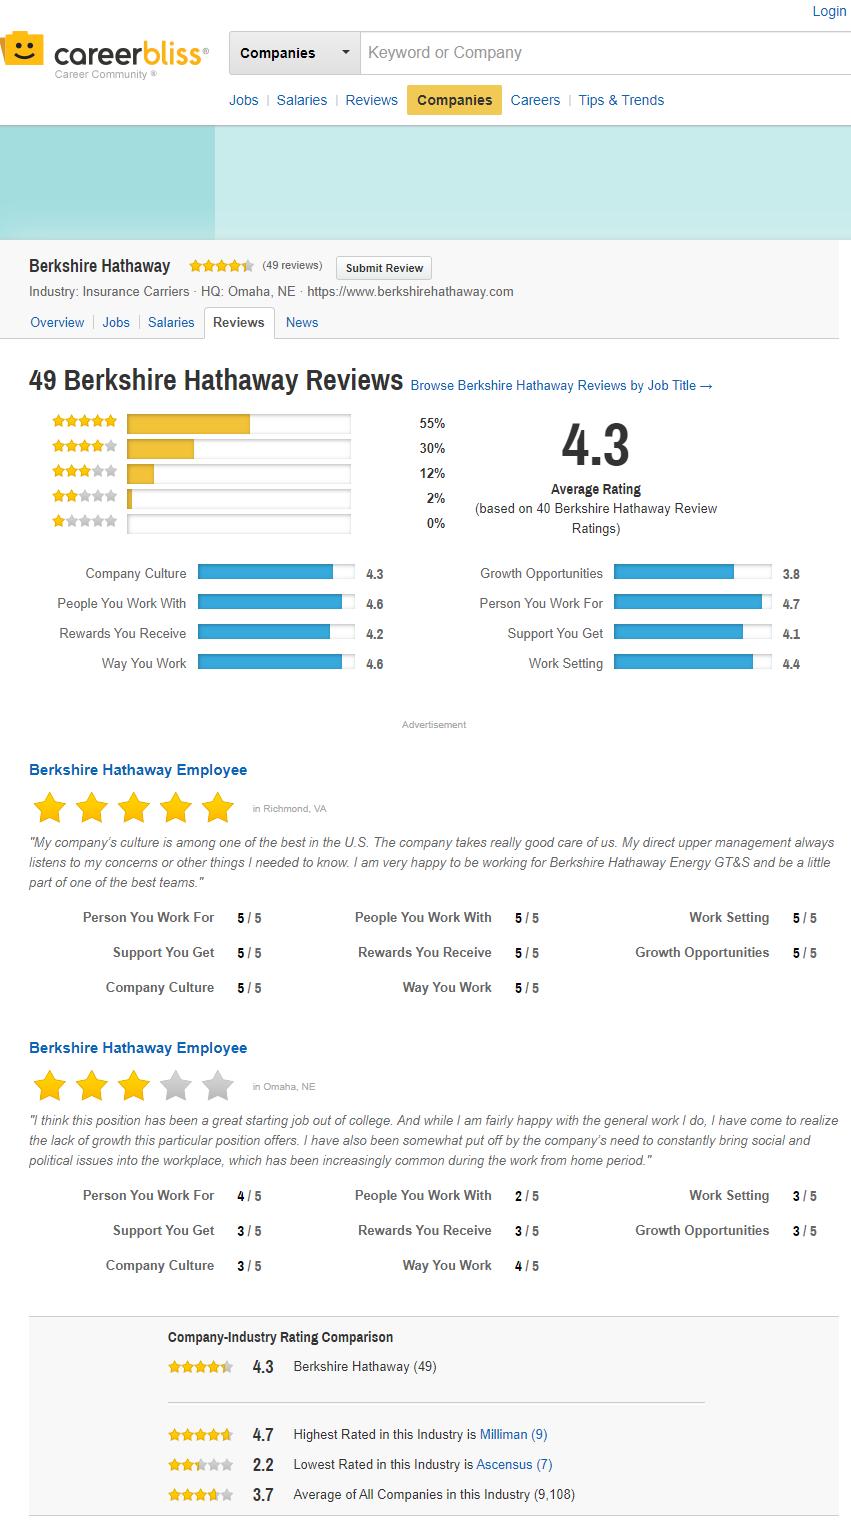 Berkshire Hathaway Reviews